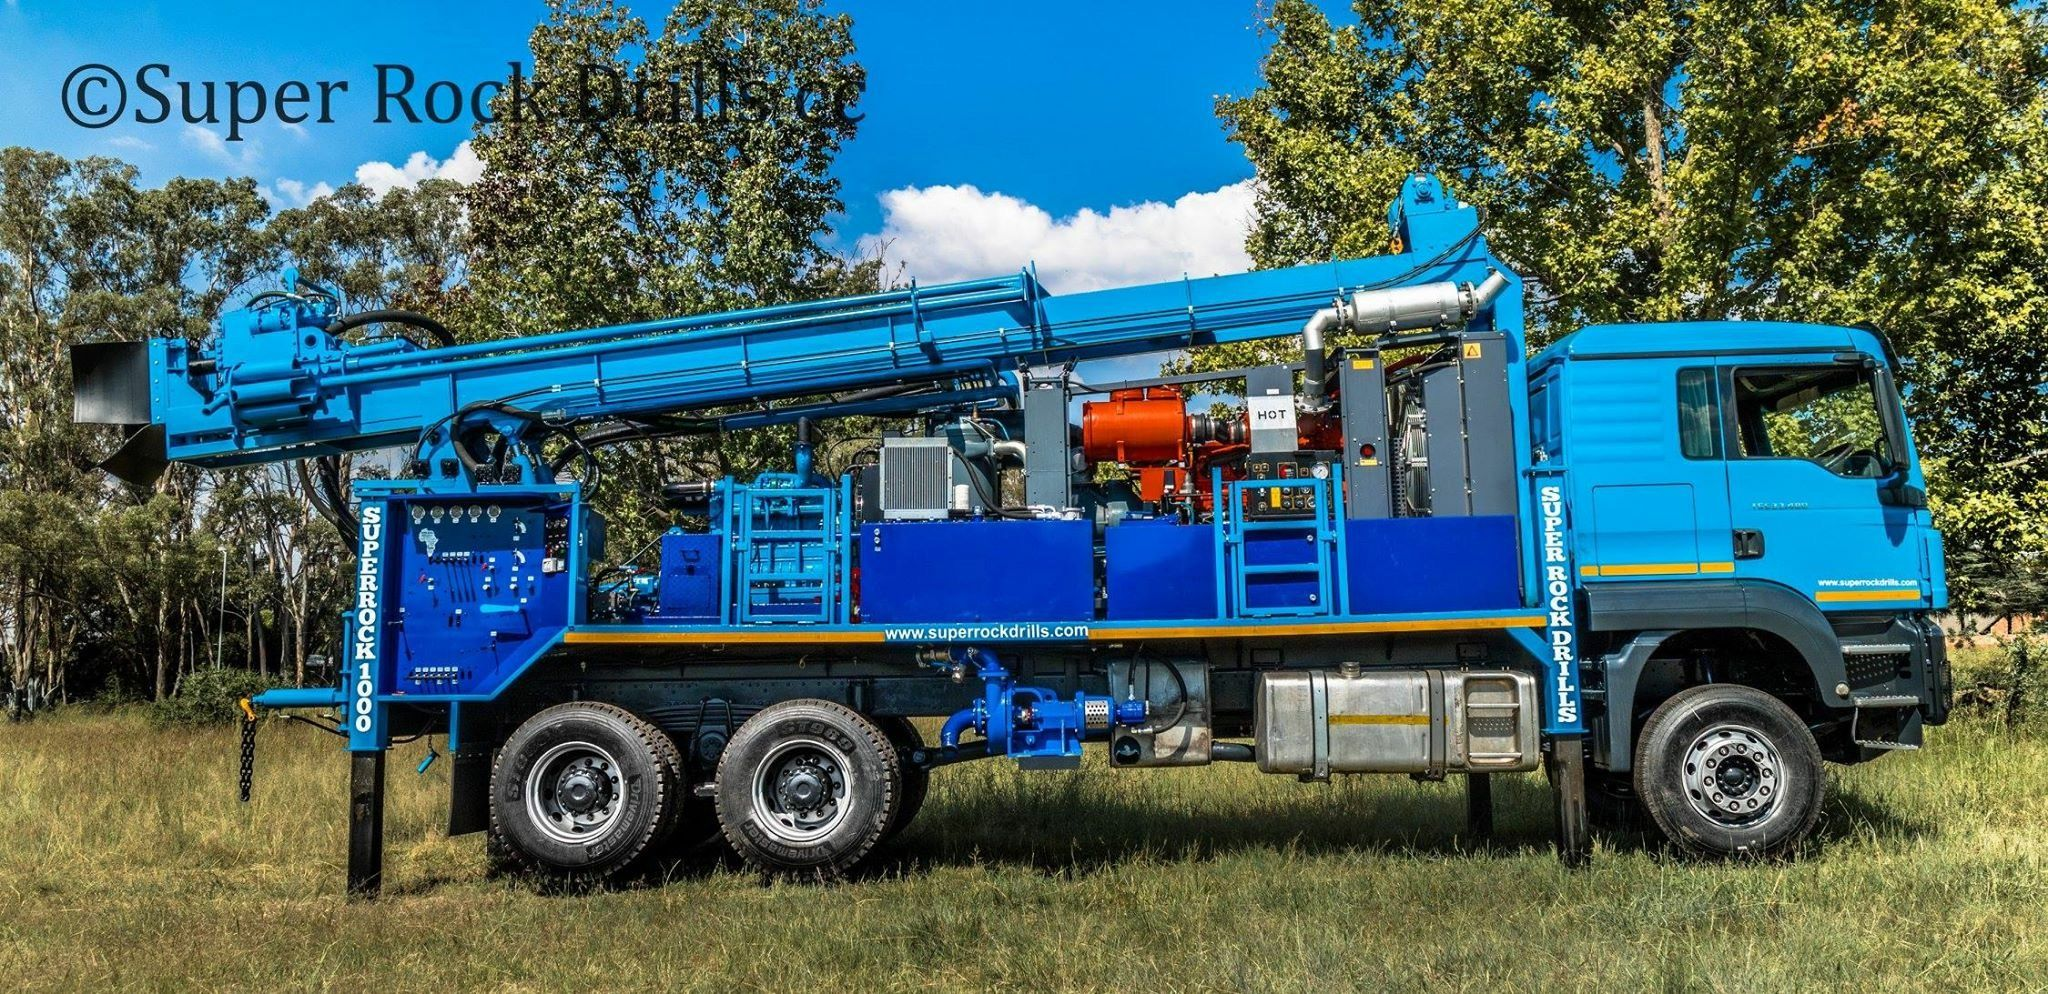 Super Rock 1000 water well rig c/w Atlas Copco compressor